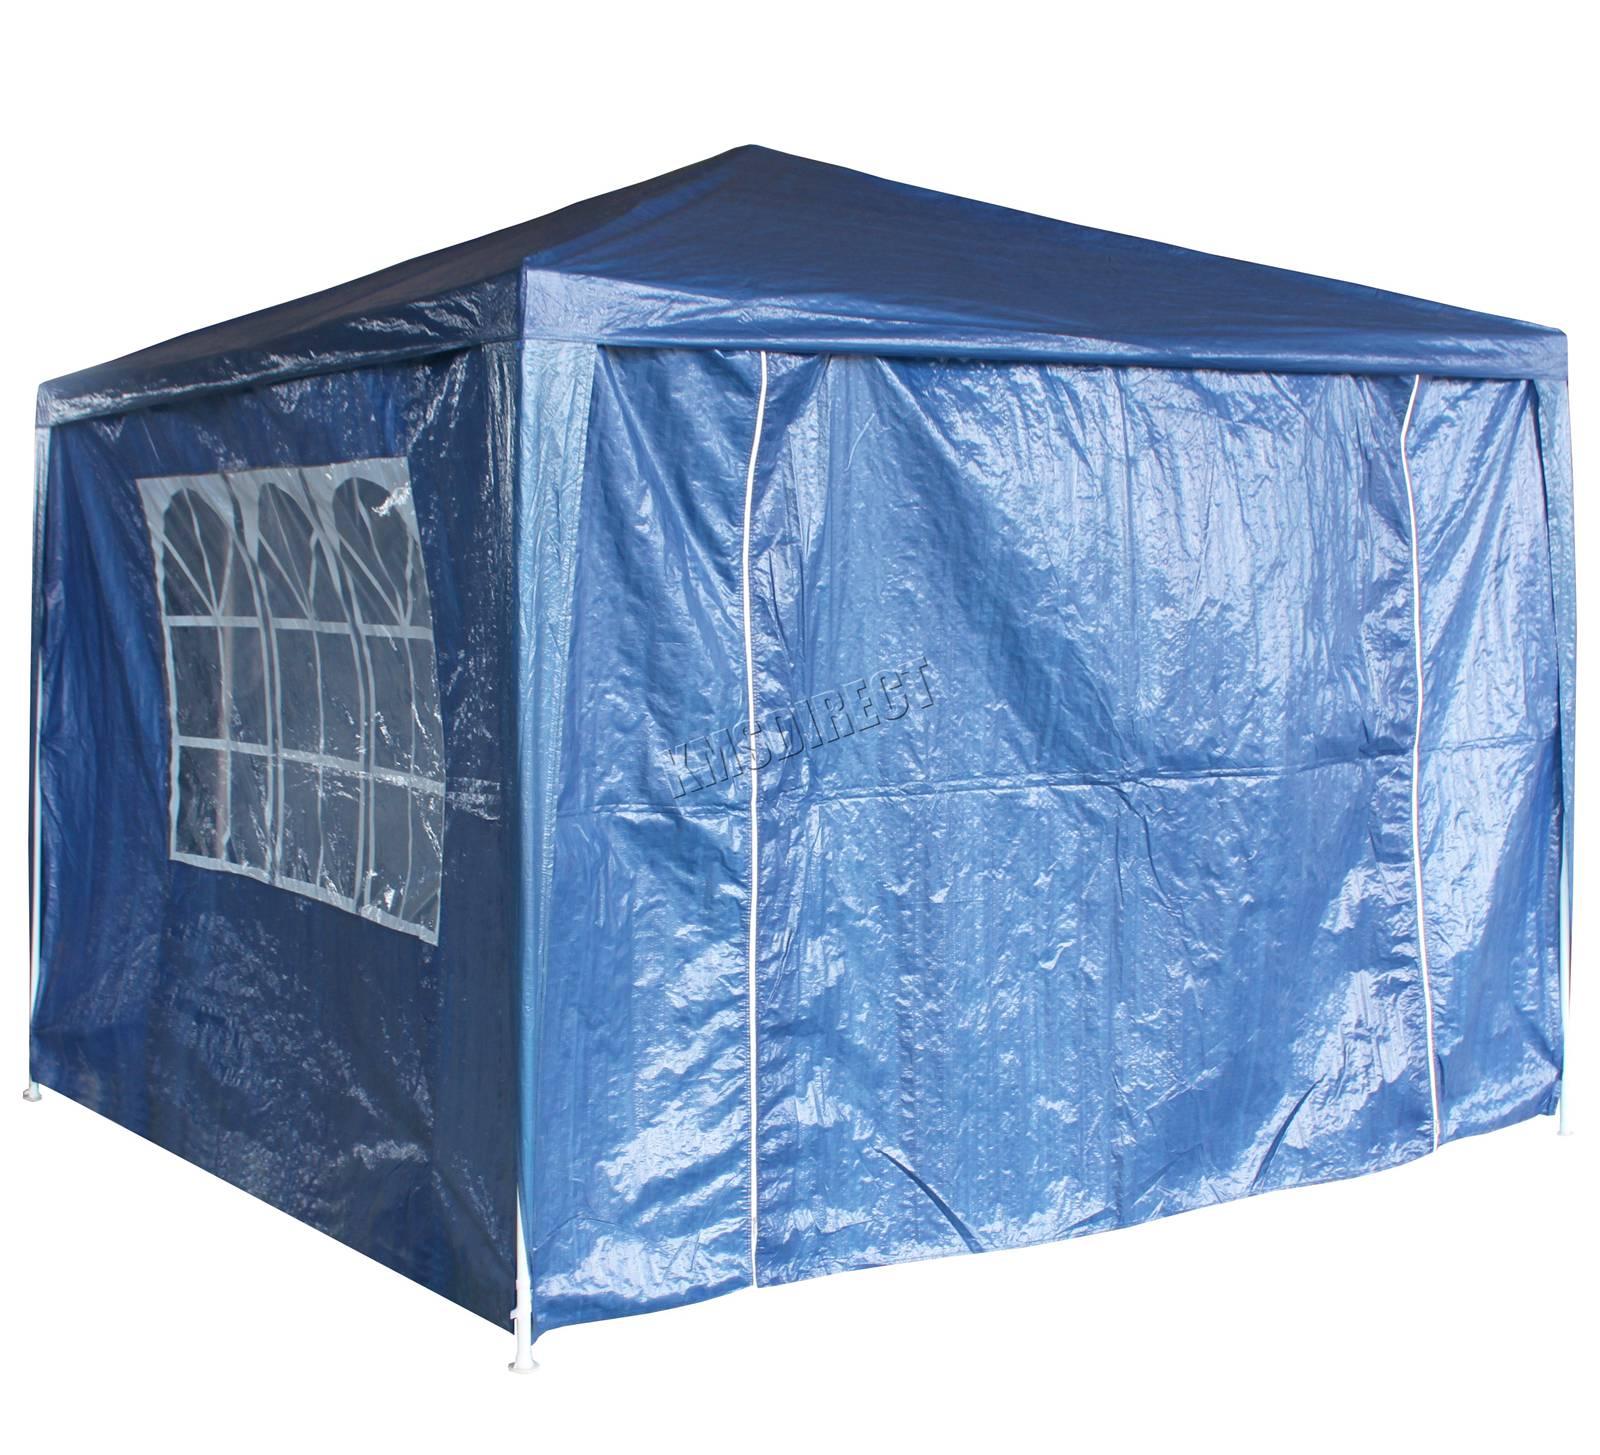 New-3-x-3m-120g-Waterproof-Outdoor-PE-Garden-Gazebo-Marquee-Canopy-Party-Tent Indexbild 19